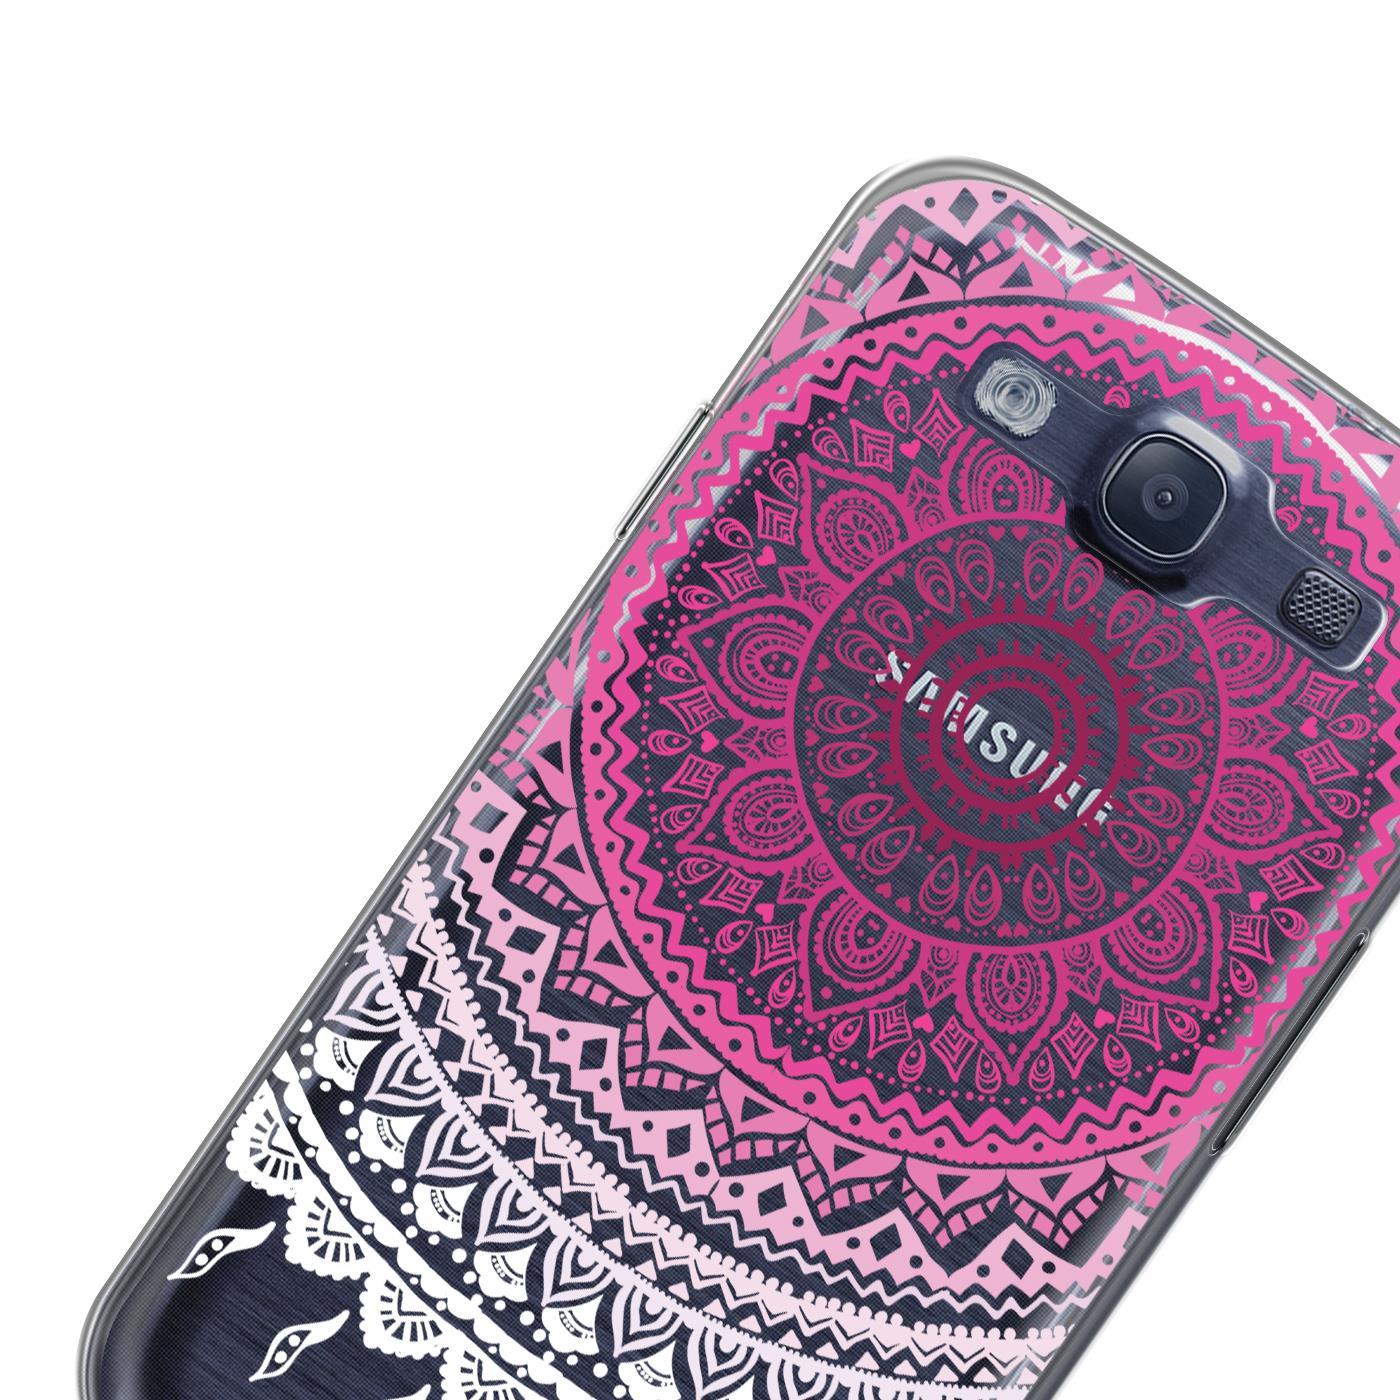 Samsung-Galaxy-S3-Neo-Handy-Schutz-Huelle-Case-TPU-Silikon-Cover-Tasche-Mandala Indexbild 21